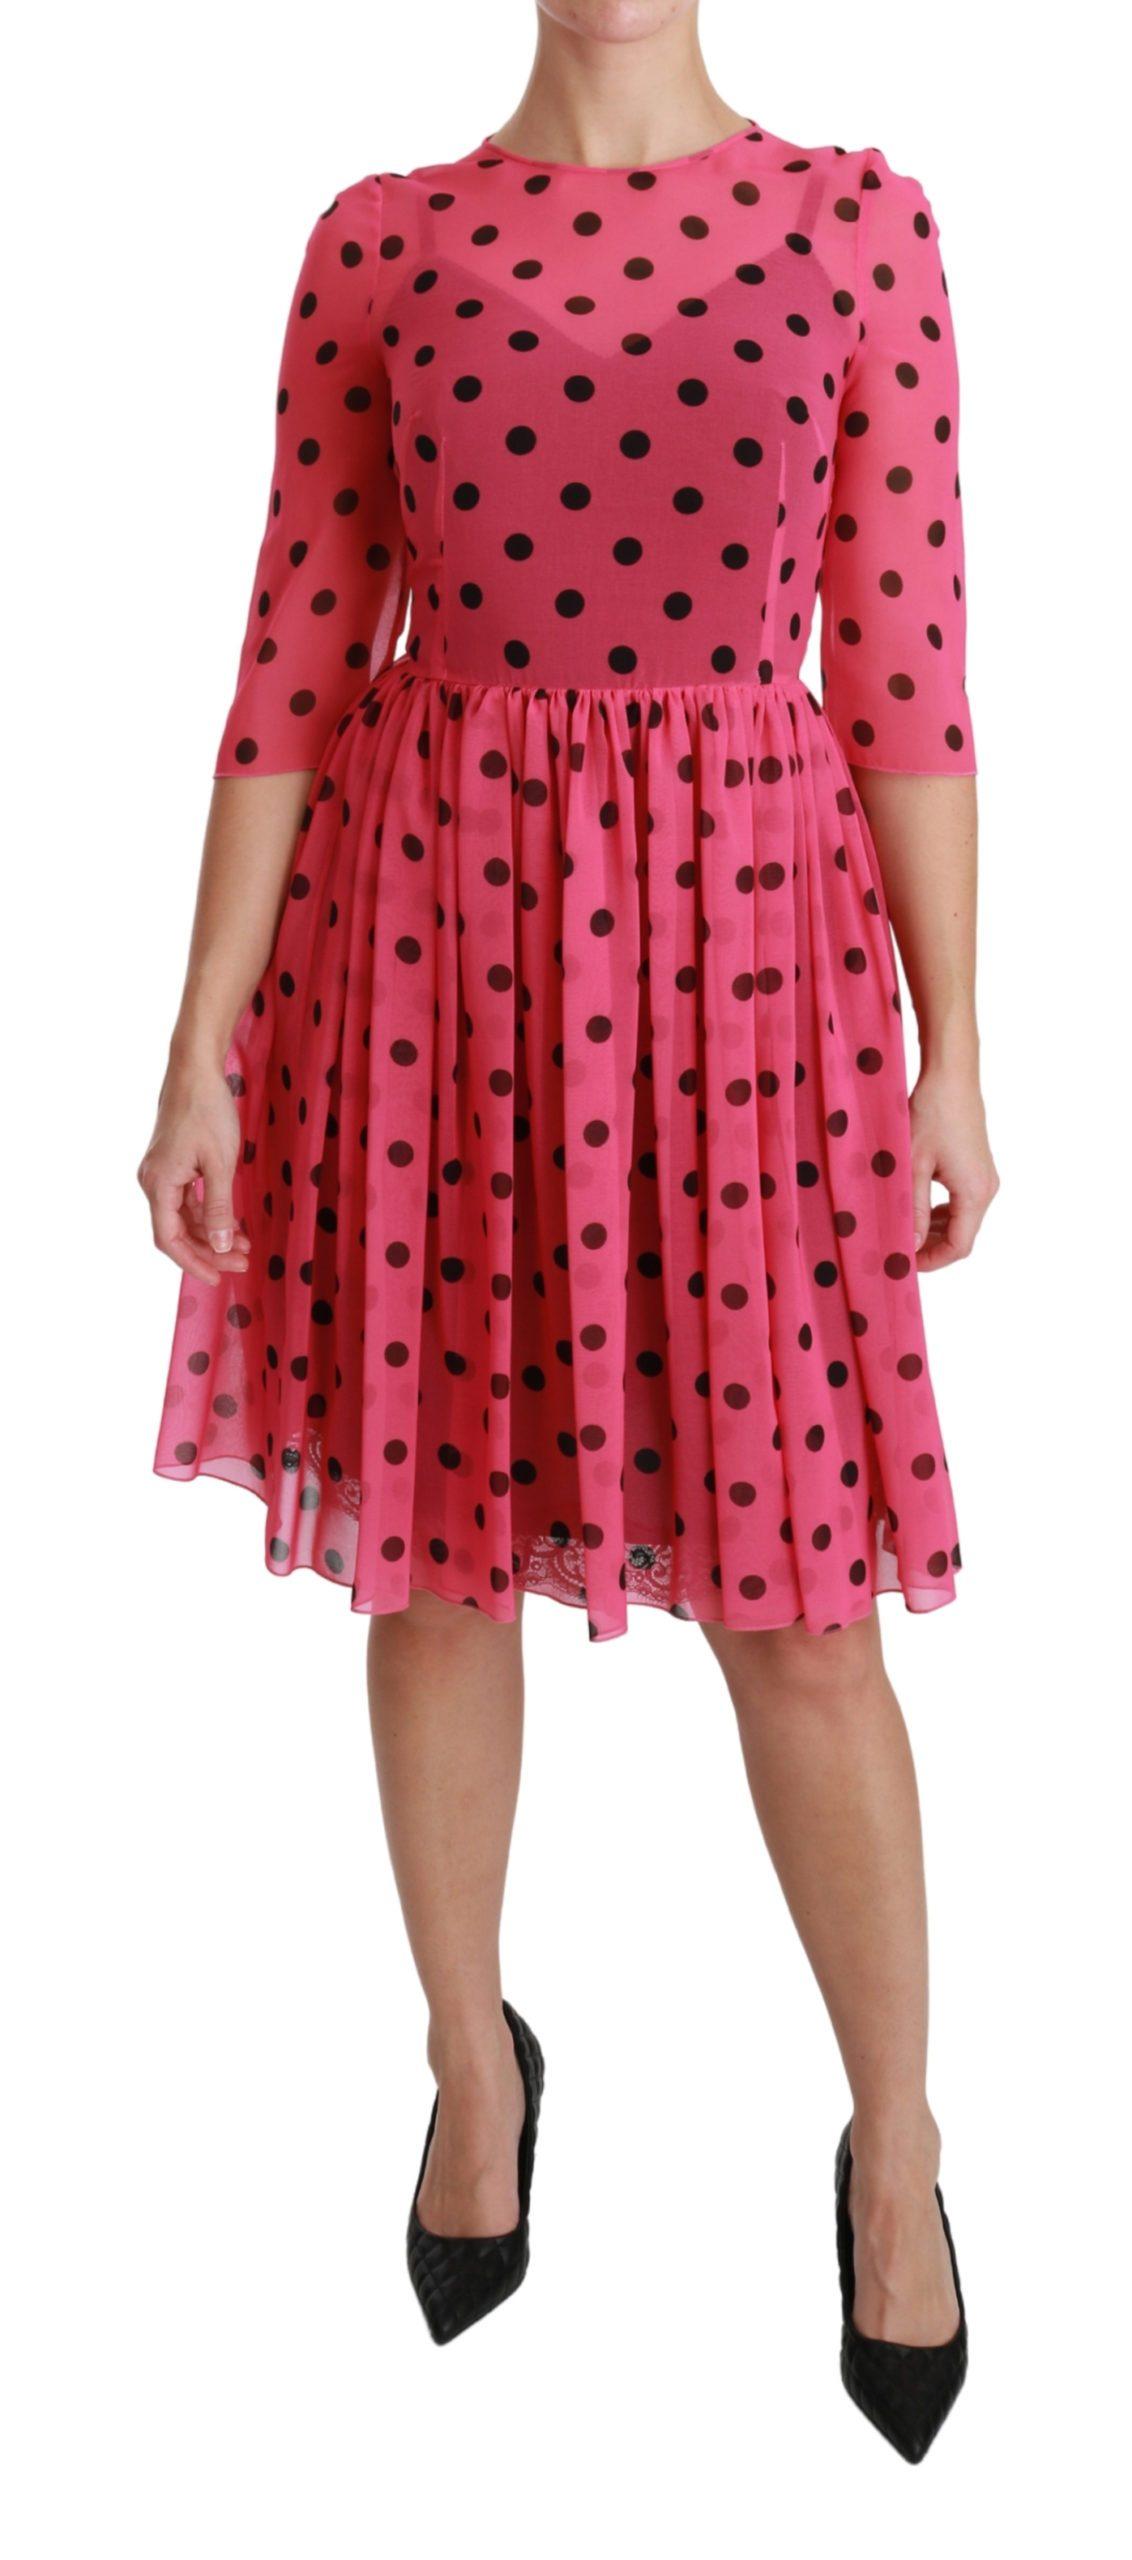 Dolce & Gabbana Women's Polka Dots A-line Knee Length Dress Pink DR2539 - IT38|XS